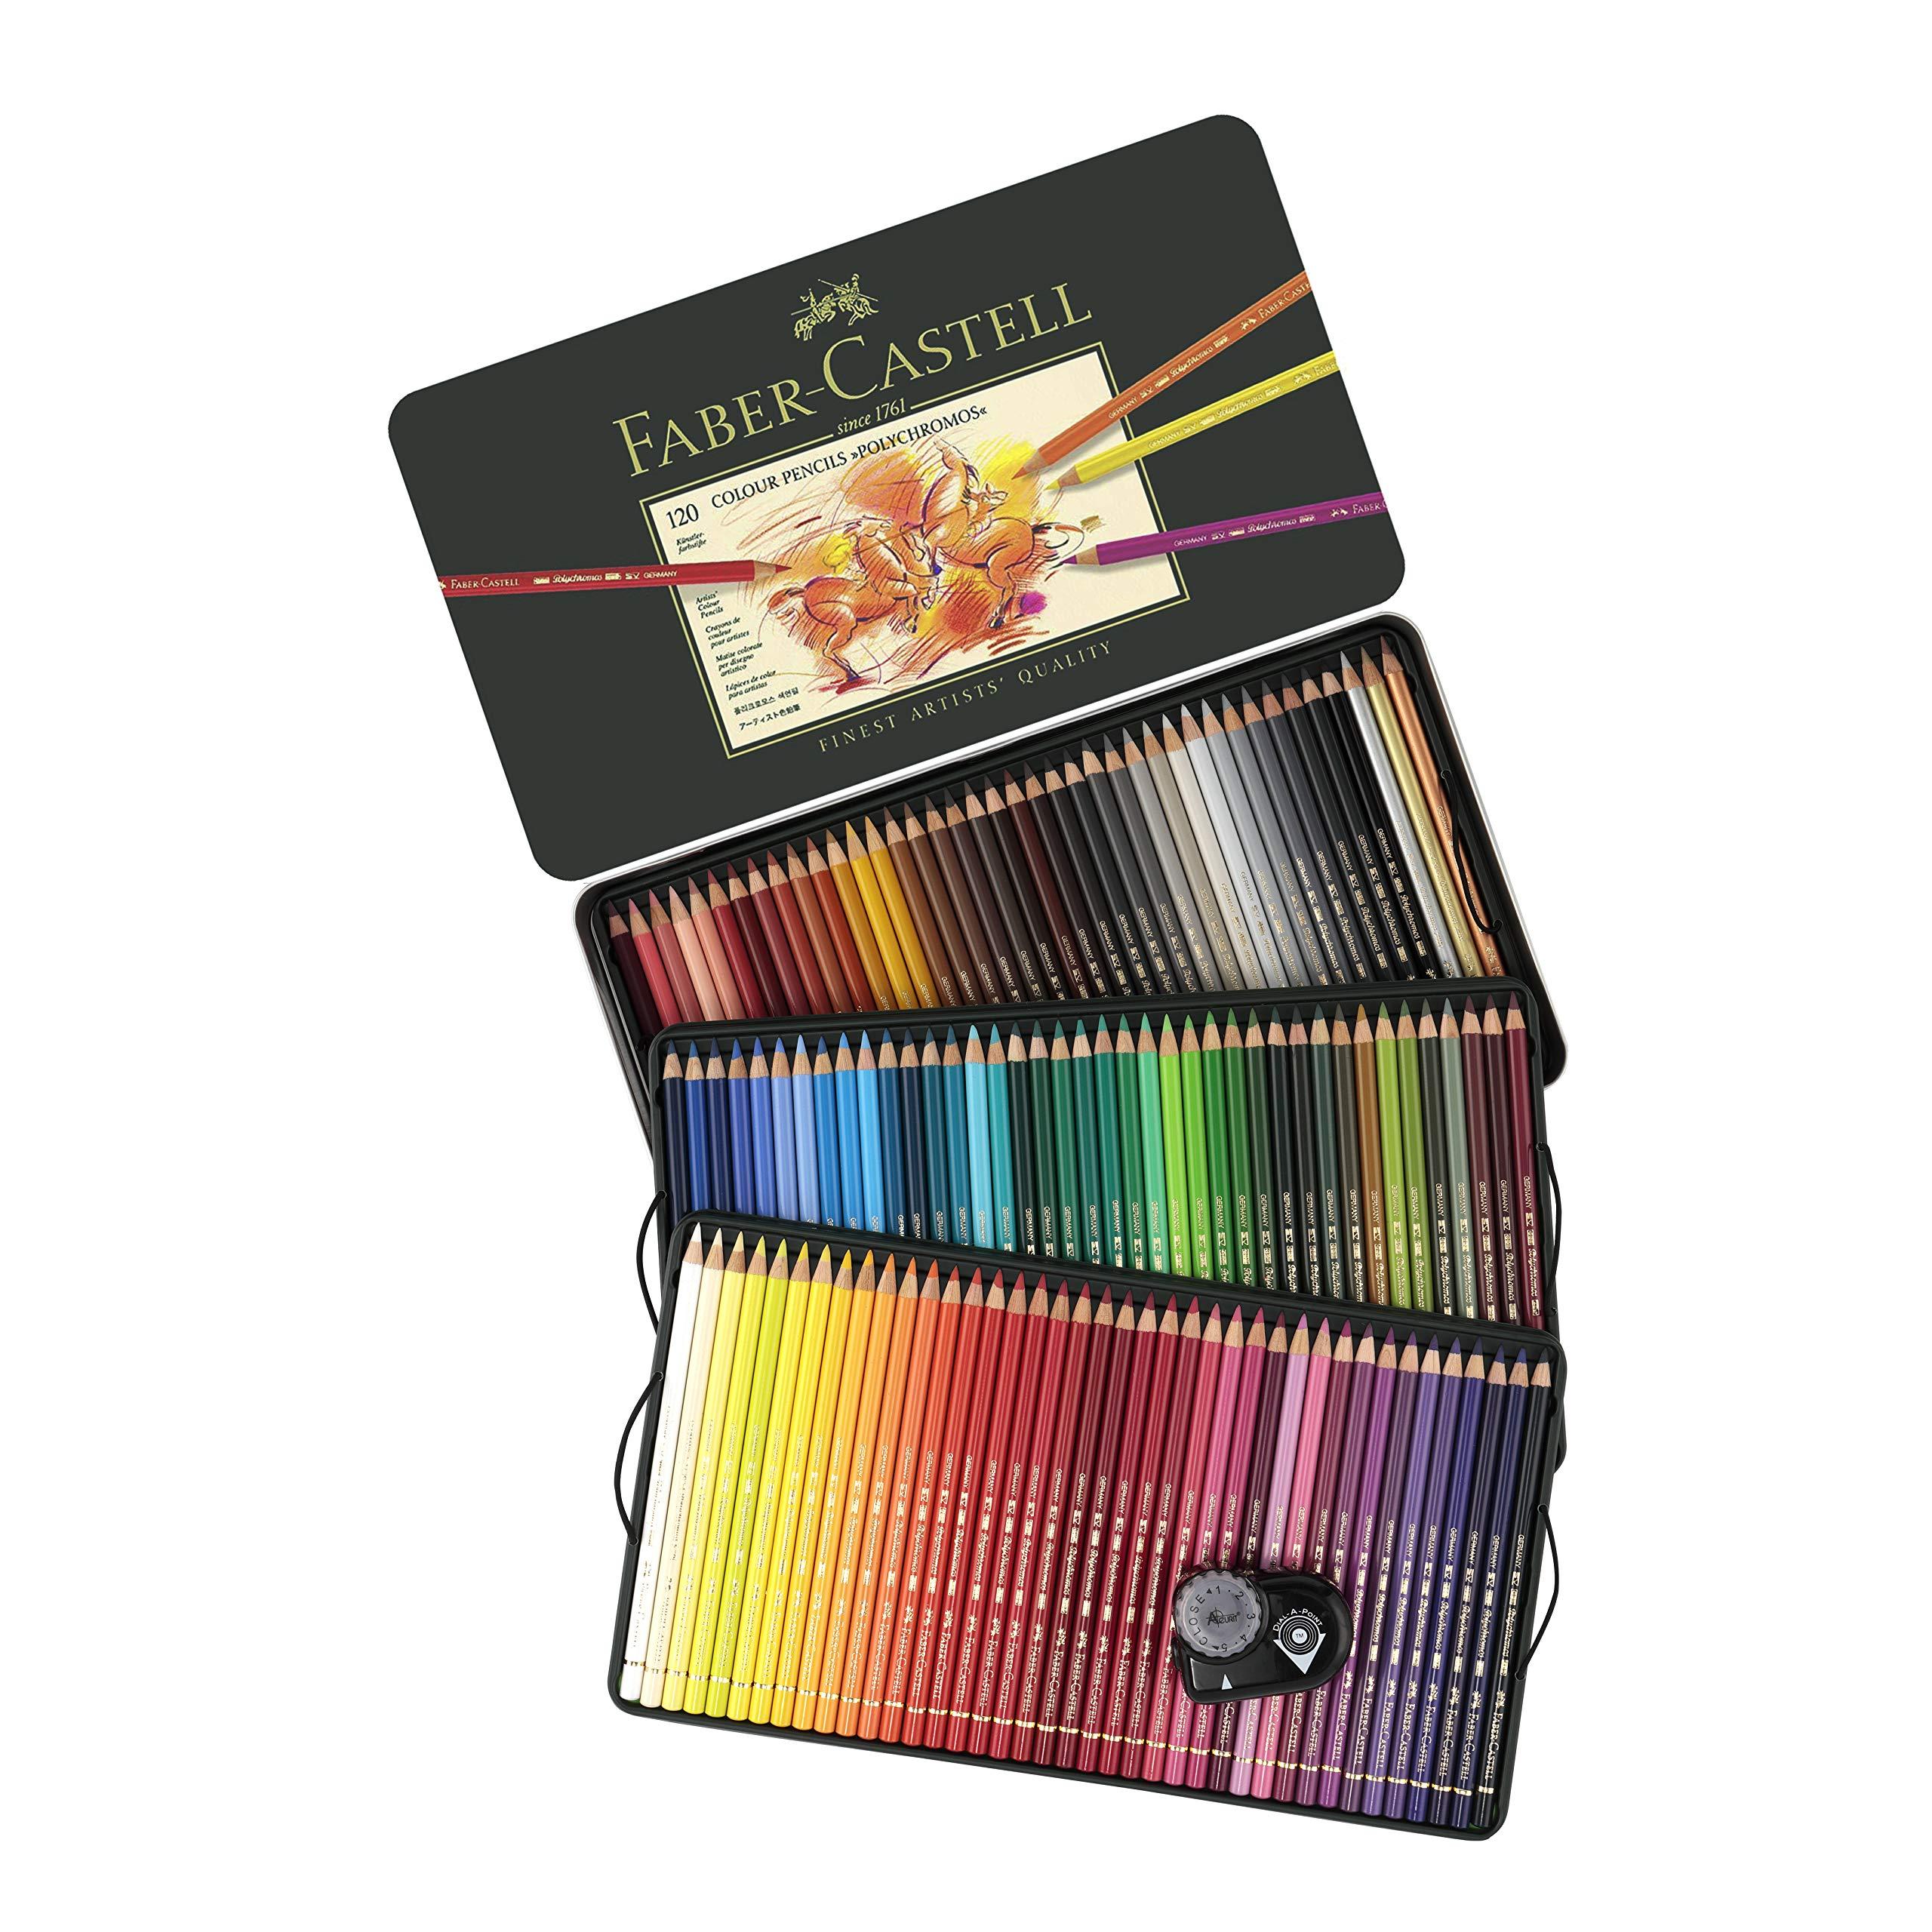 FaberCastell Polychromos Artist Colored Pencils Set - Tin of 120 Colors - Premium Quality Polychromos Colored Pencils 120 Set Art Supplies Set for Arts and Crafts Includes Pencil Sharpener